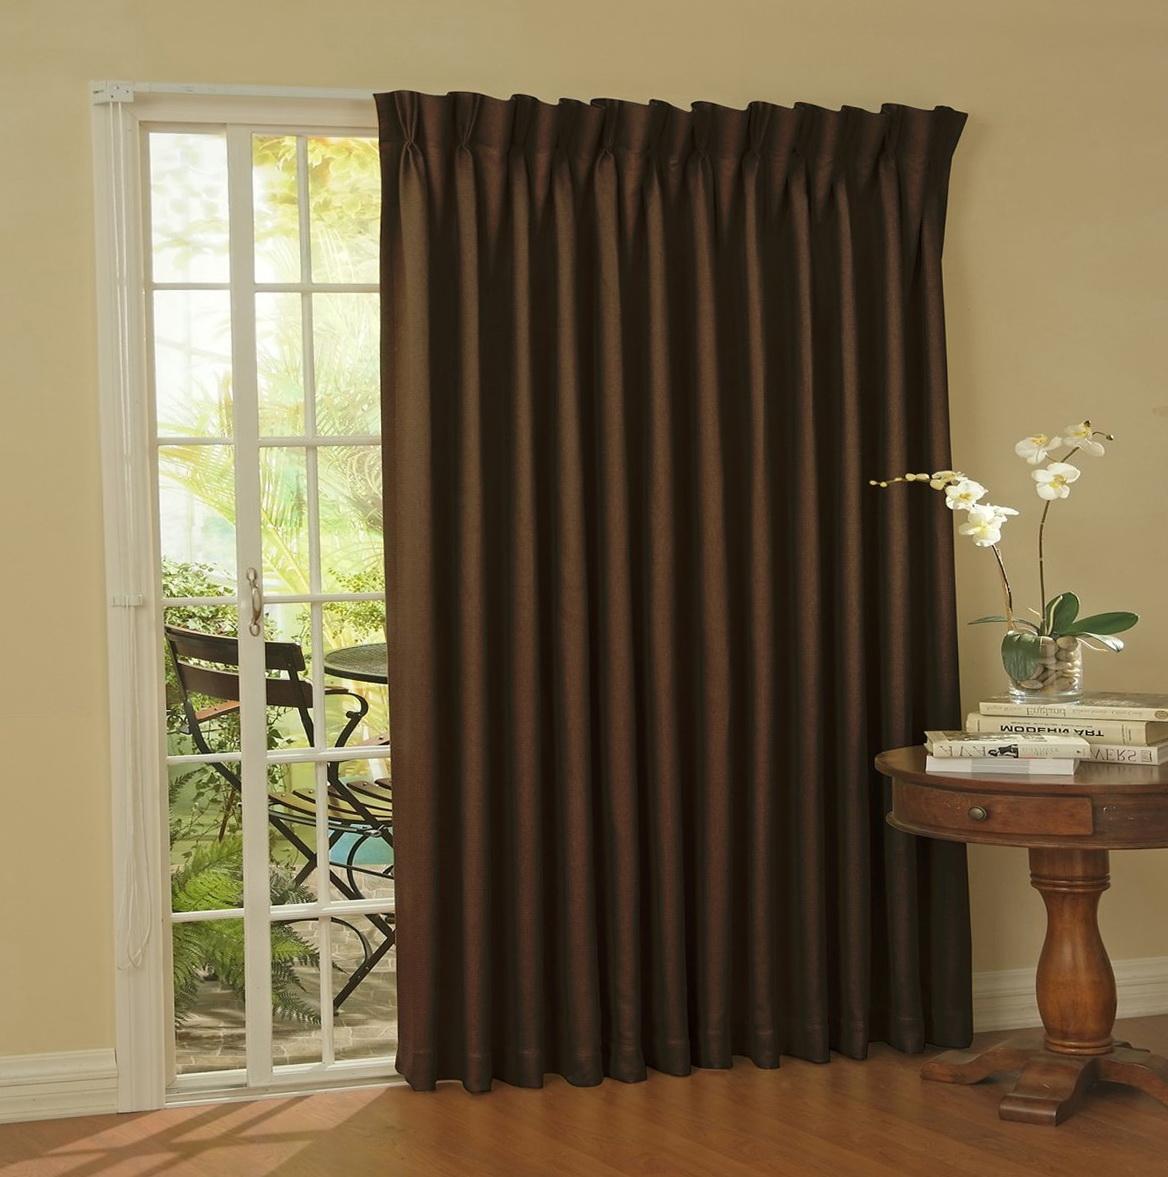 Noise Cancelling Curtains Amazon  Home Design Ideas